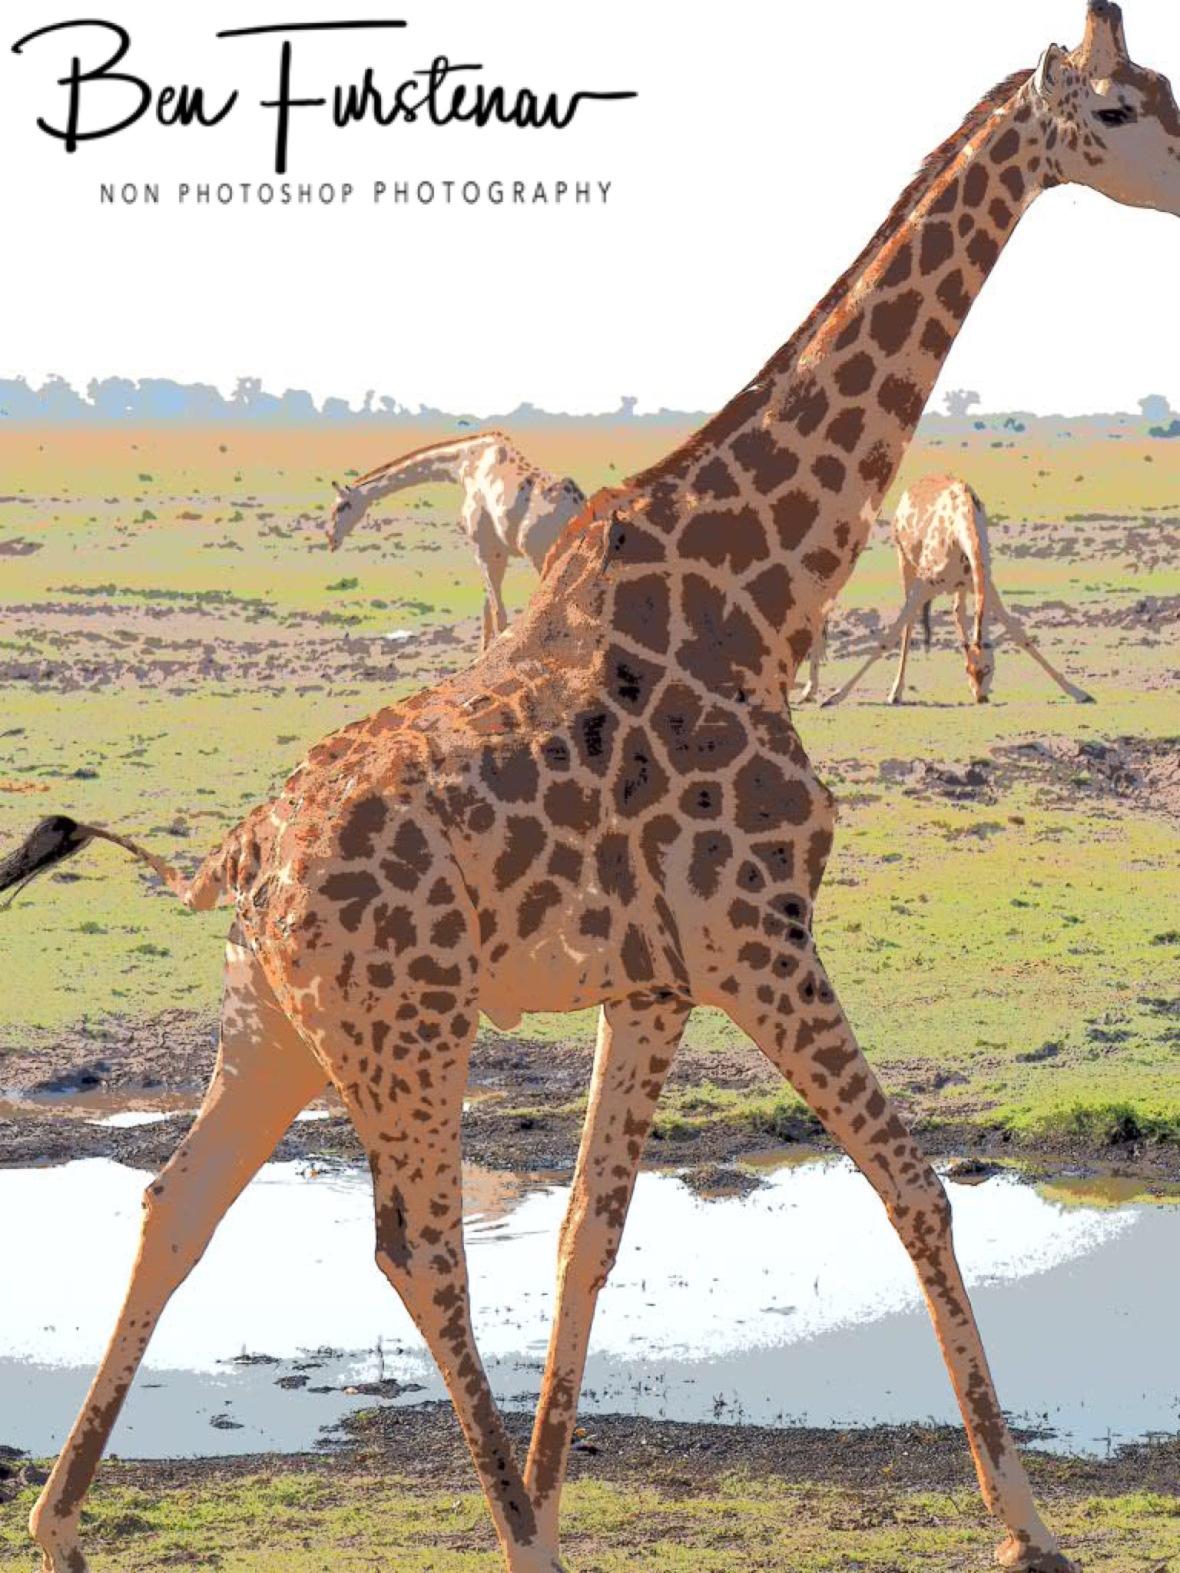 Giraffes near and far, Chobe National Park, Botswana